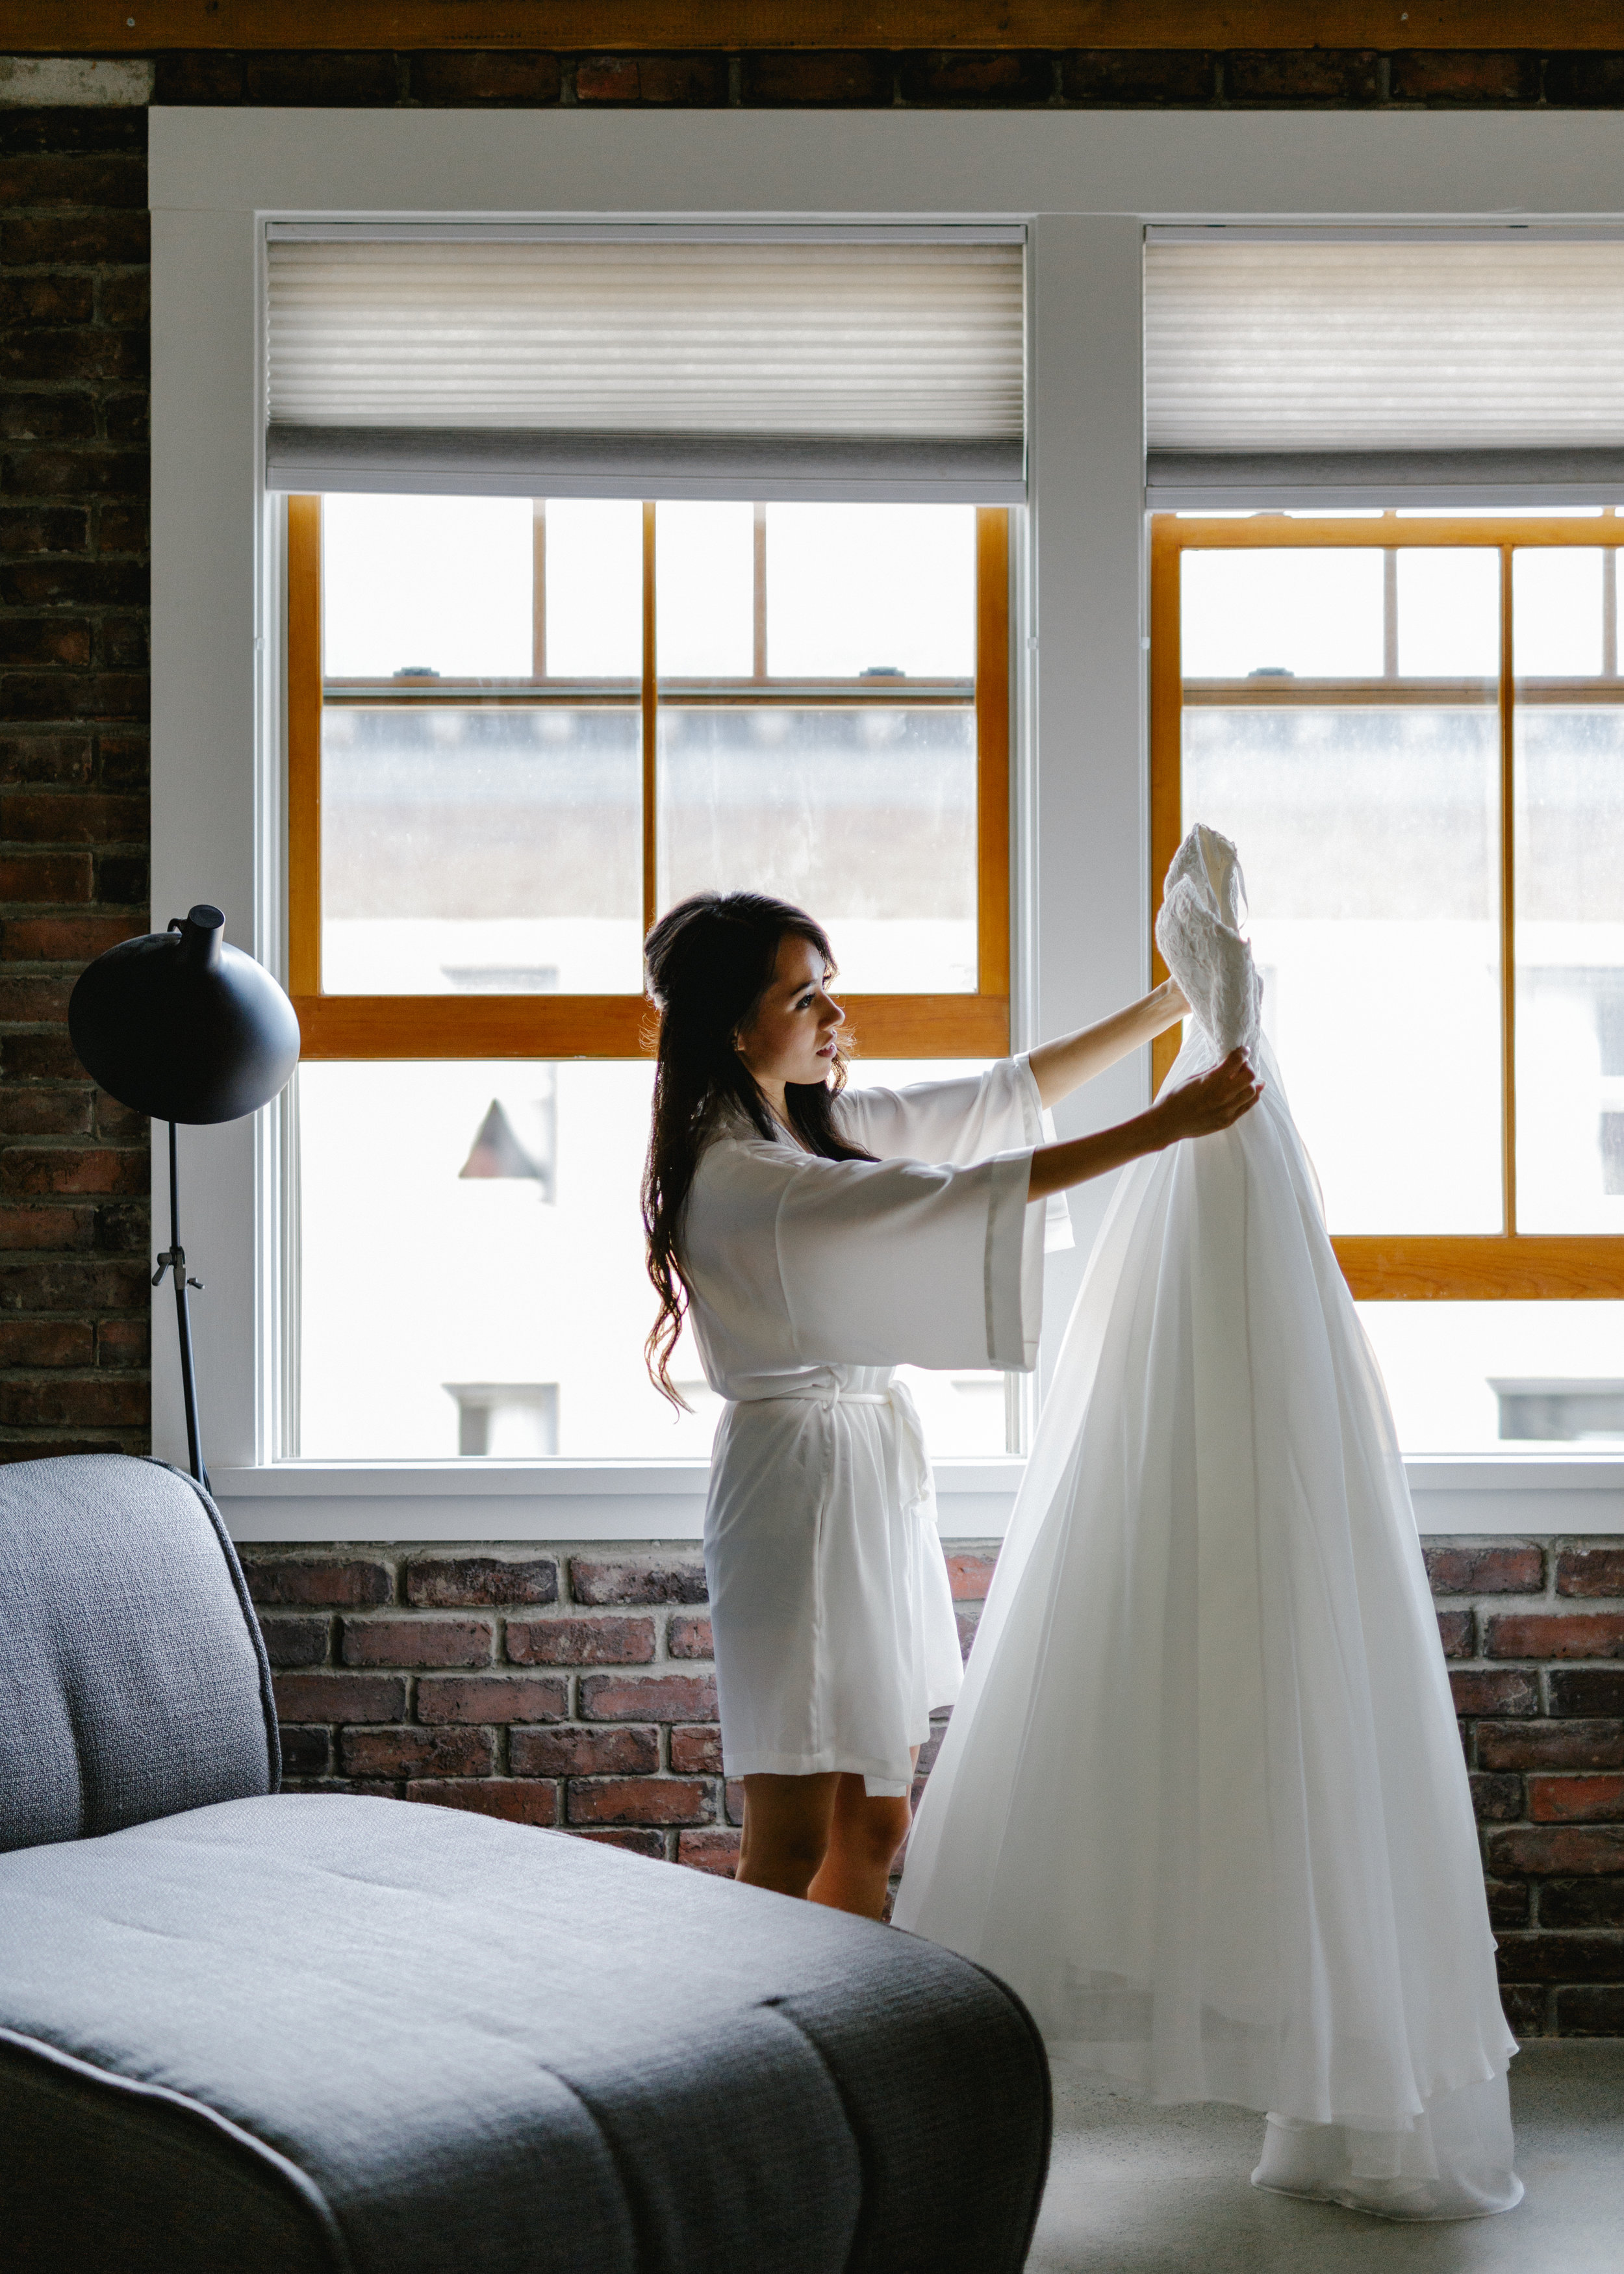 herafilms_wedding_priscilla_adrian_hera_selects-15.jpg